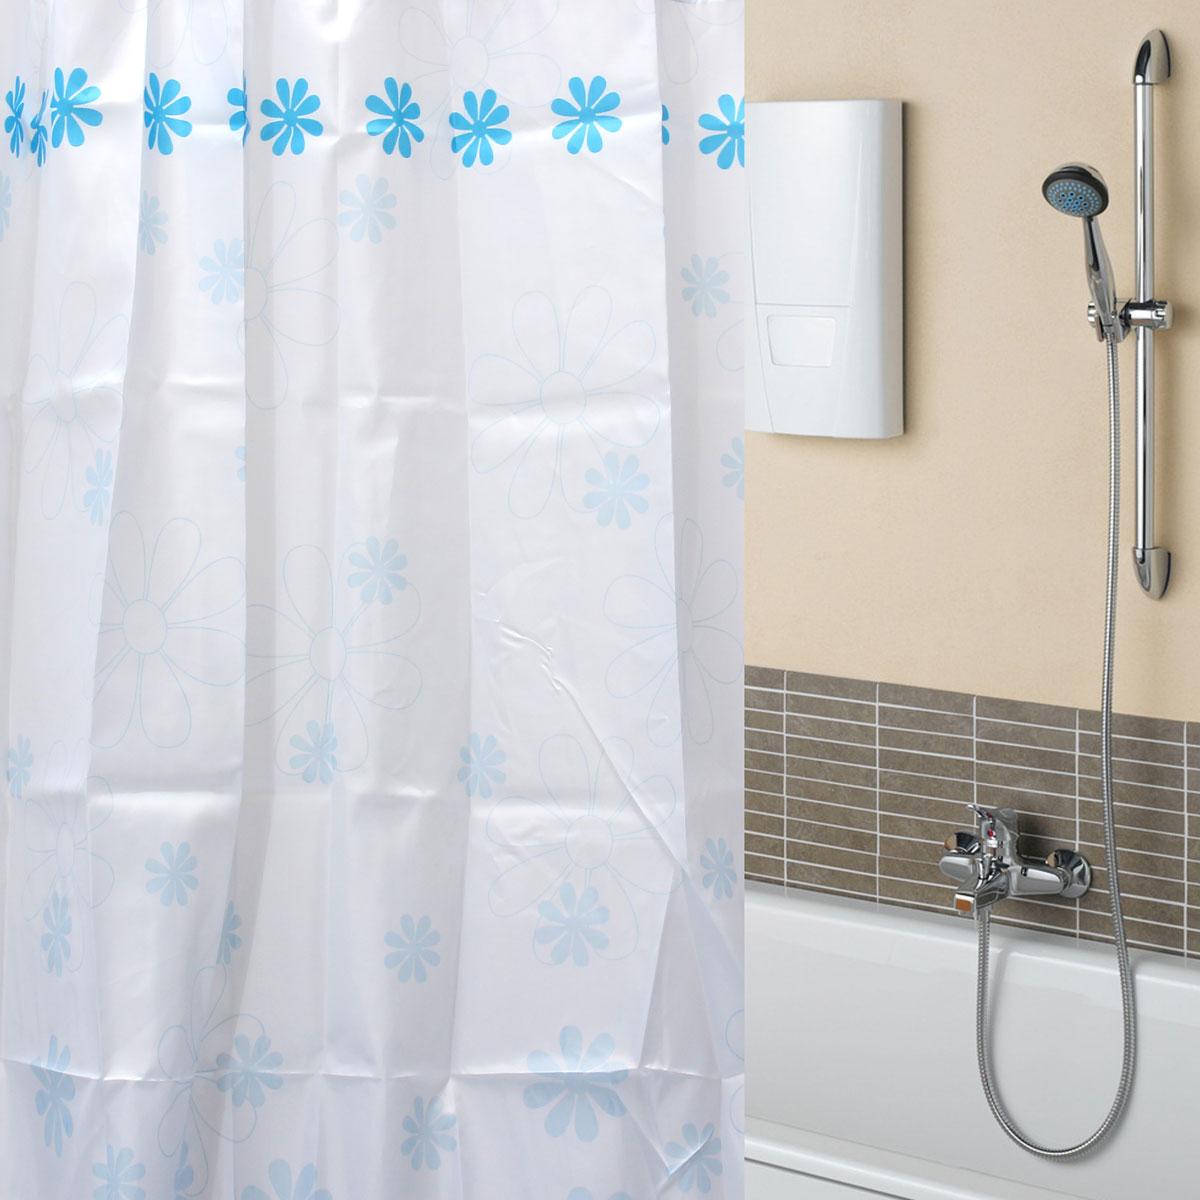 170 180cmx180cm tende tendina da doccia 8 10 12 ganci vasca bagno shower curtain ebay - Tende da doccia ...